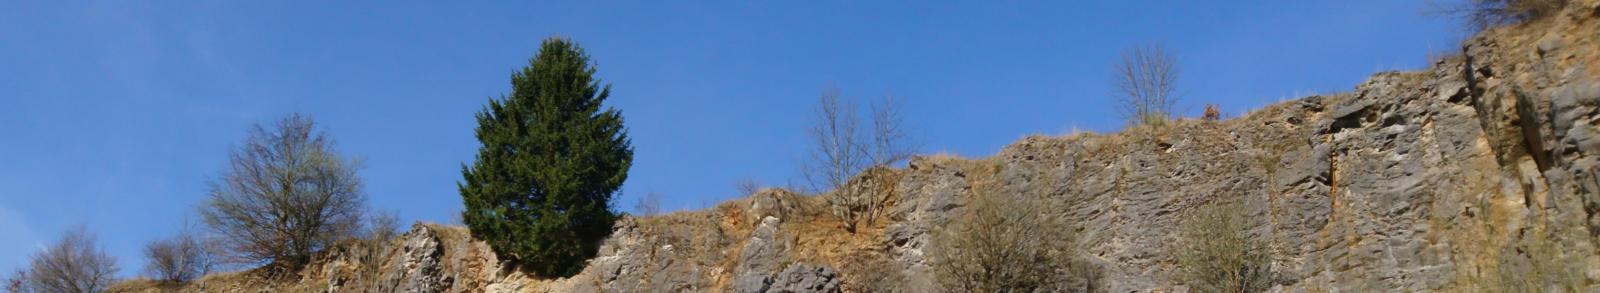 Klettergebiet Unterer Elberskamp